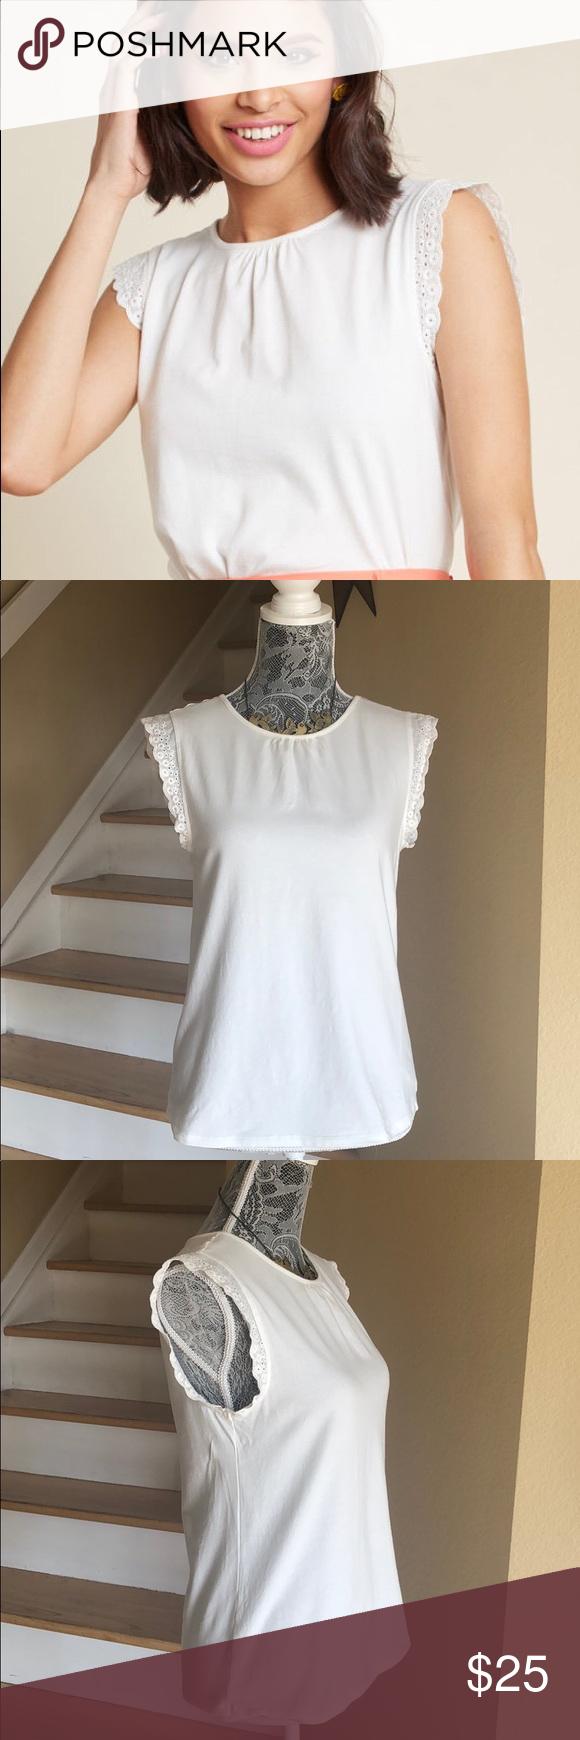 8e46233850c7a5 ModCloth Glam Garnish Sleeveless Top Not your basic tank top! ModCloth Glam  Garnish Sleeveless Knit